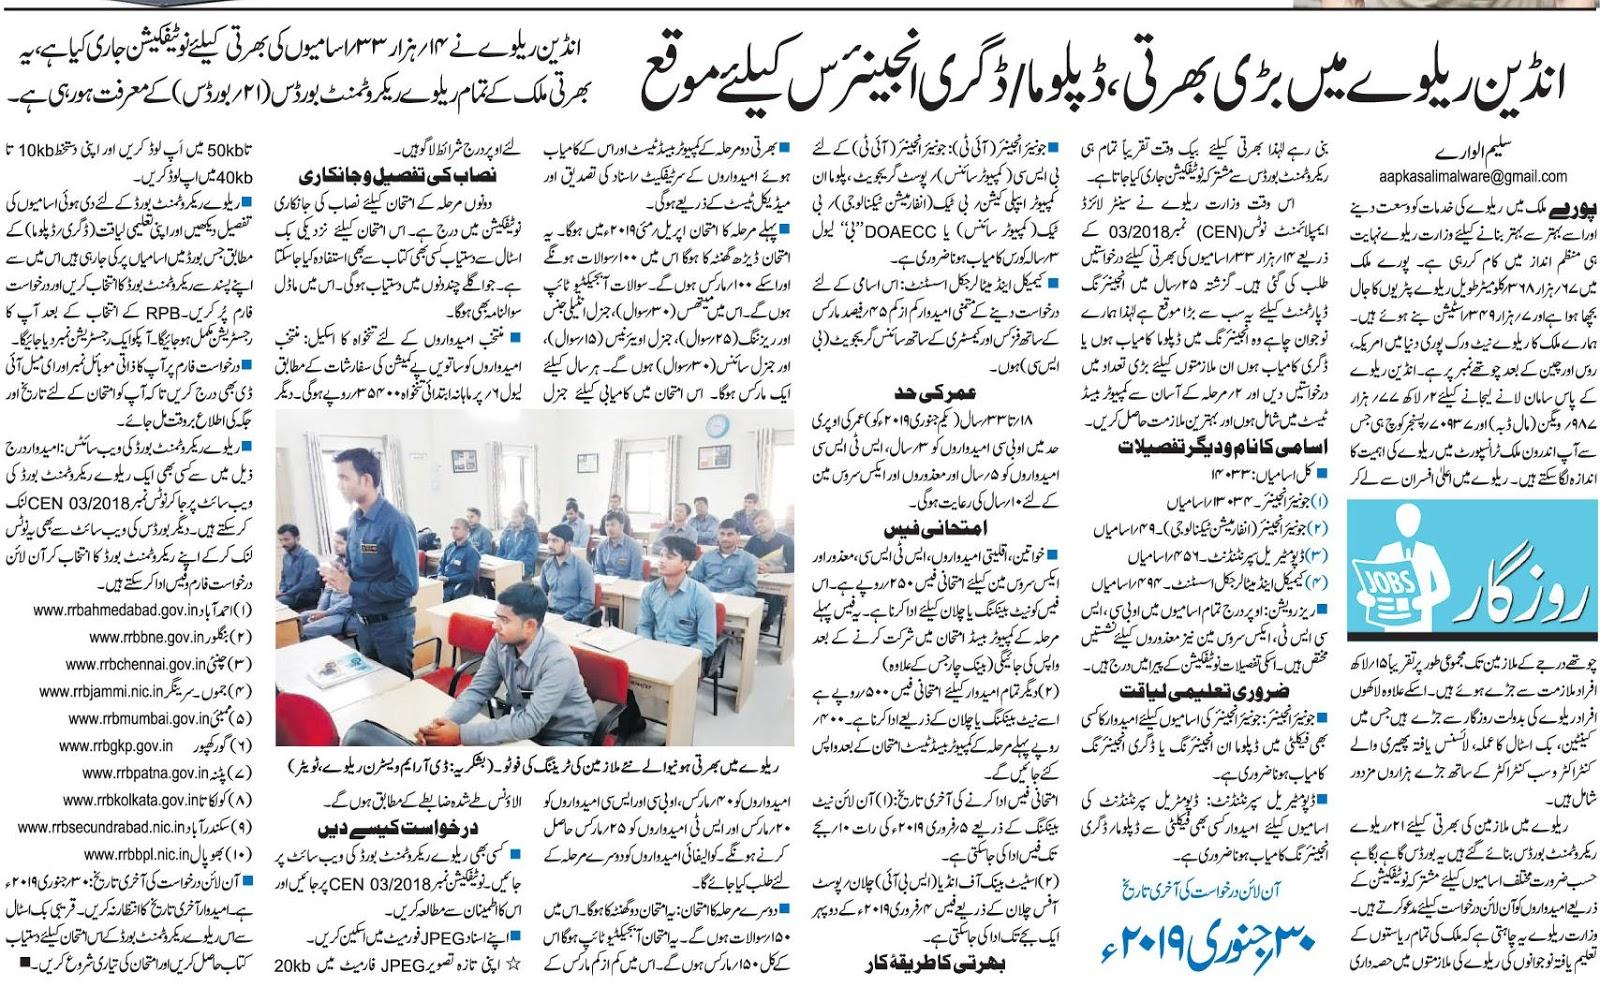 KRRC@AIKTC: Indian Railway mein badi bharti, Diploma / Degree